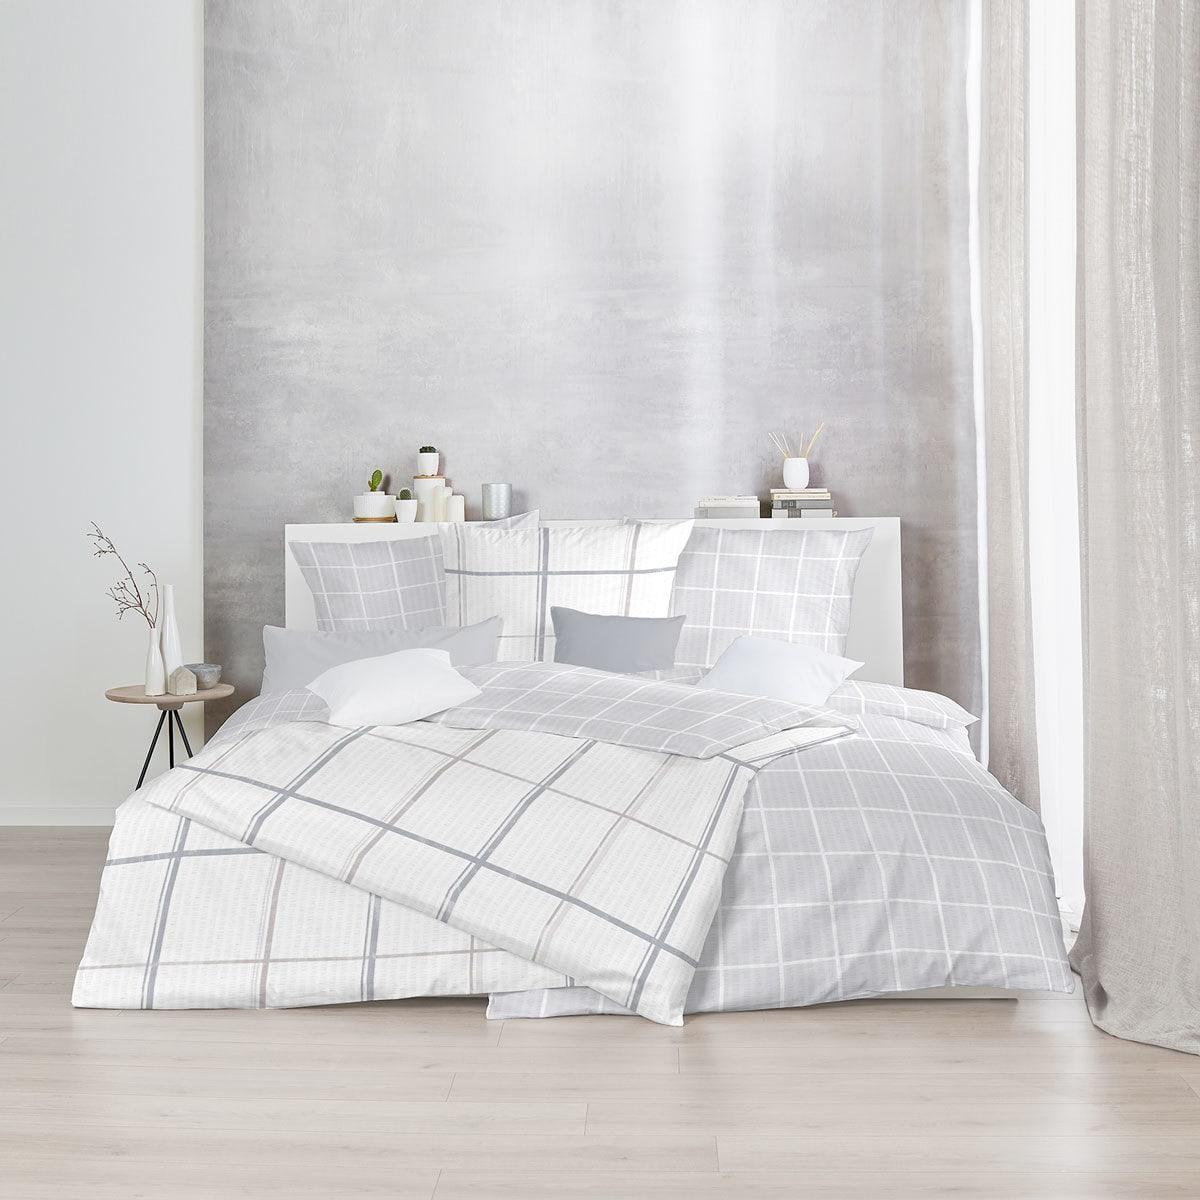 enrico coss baumwoll seersucker bettw sche molde wei grau. Black Bedroom Furniture Sets. Home Design Ideas